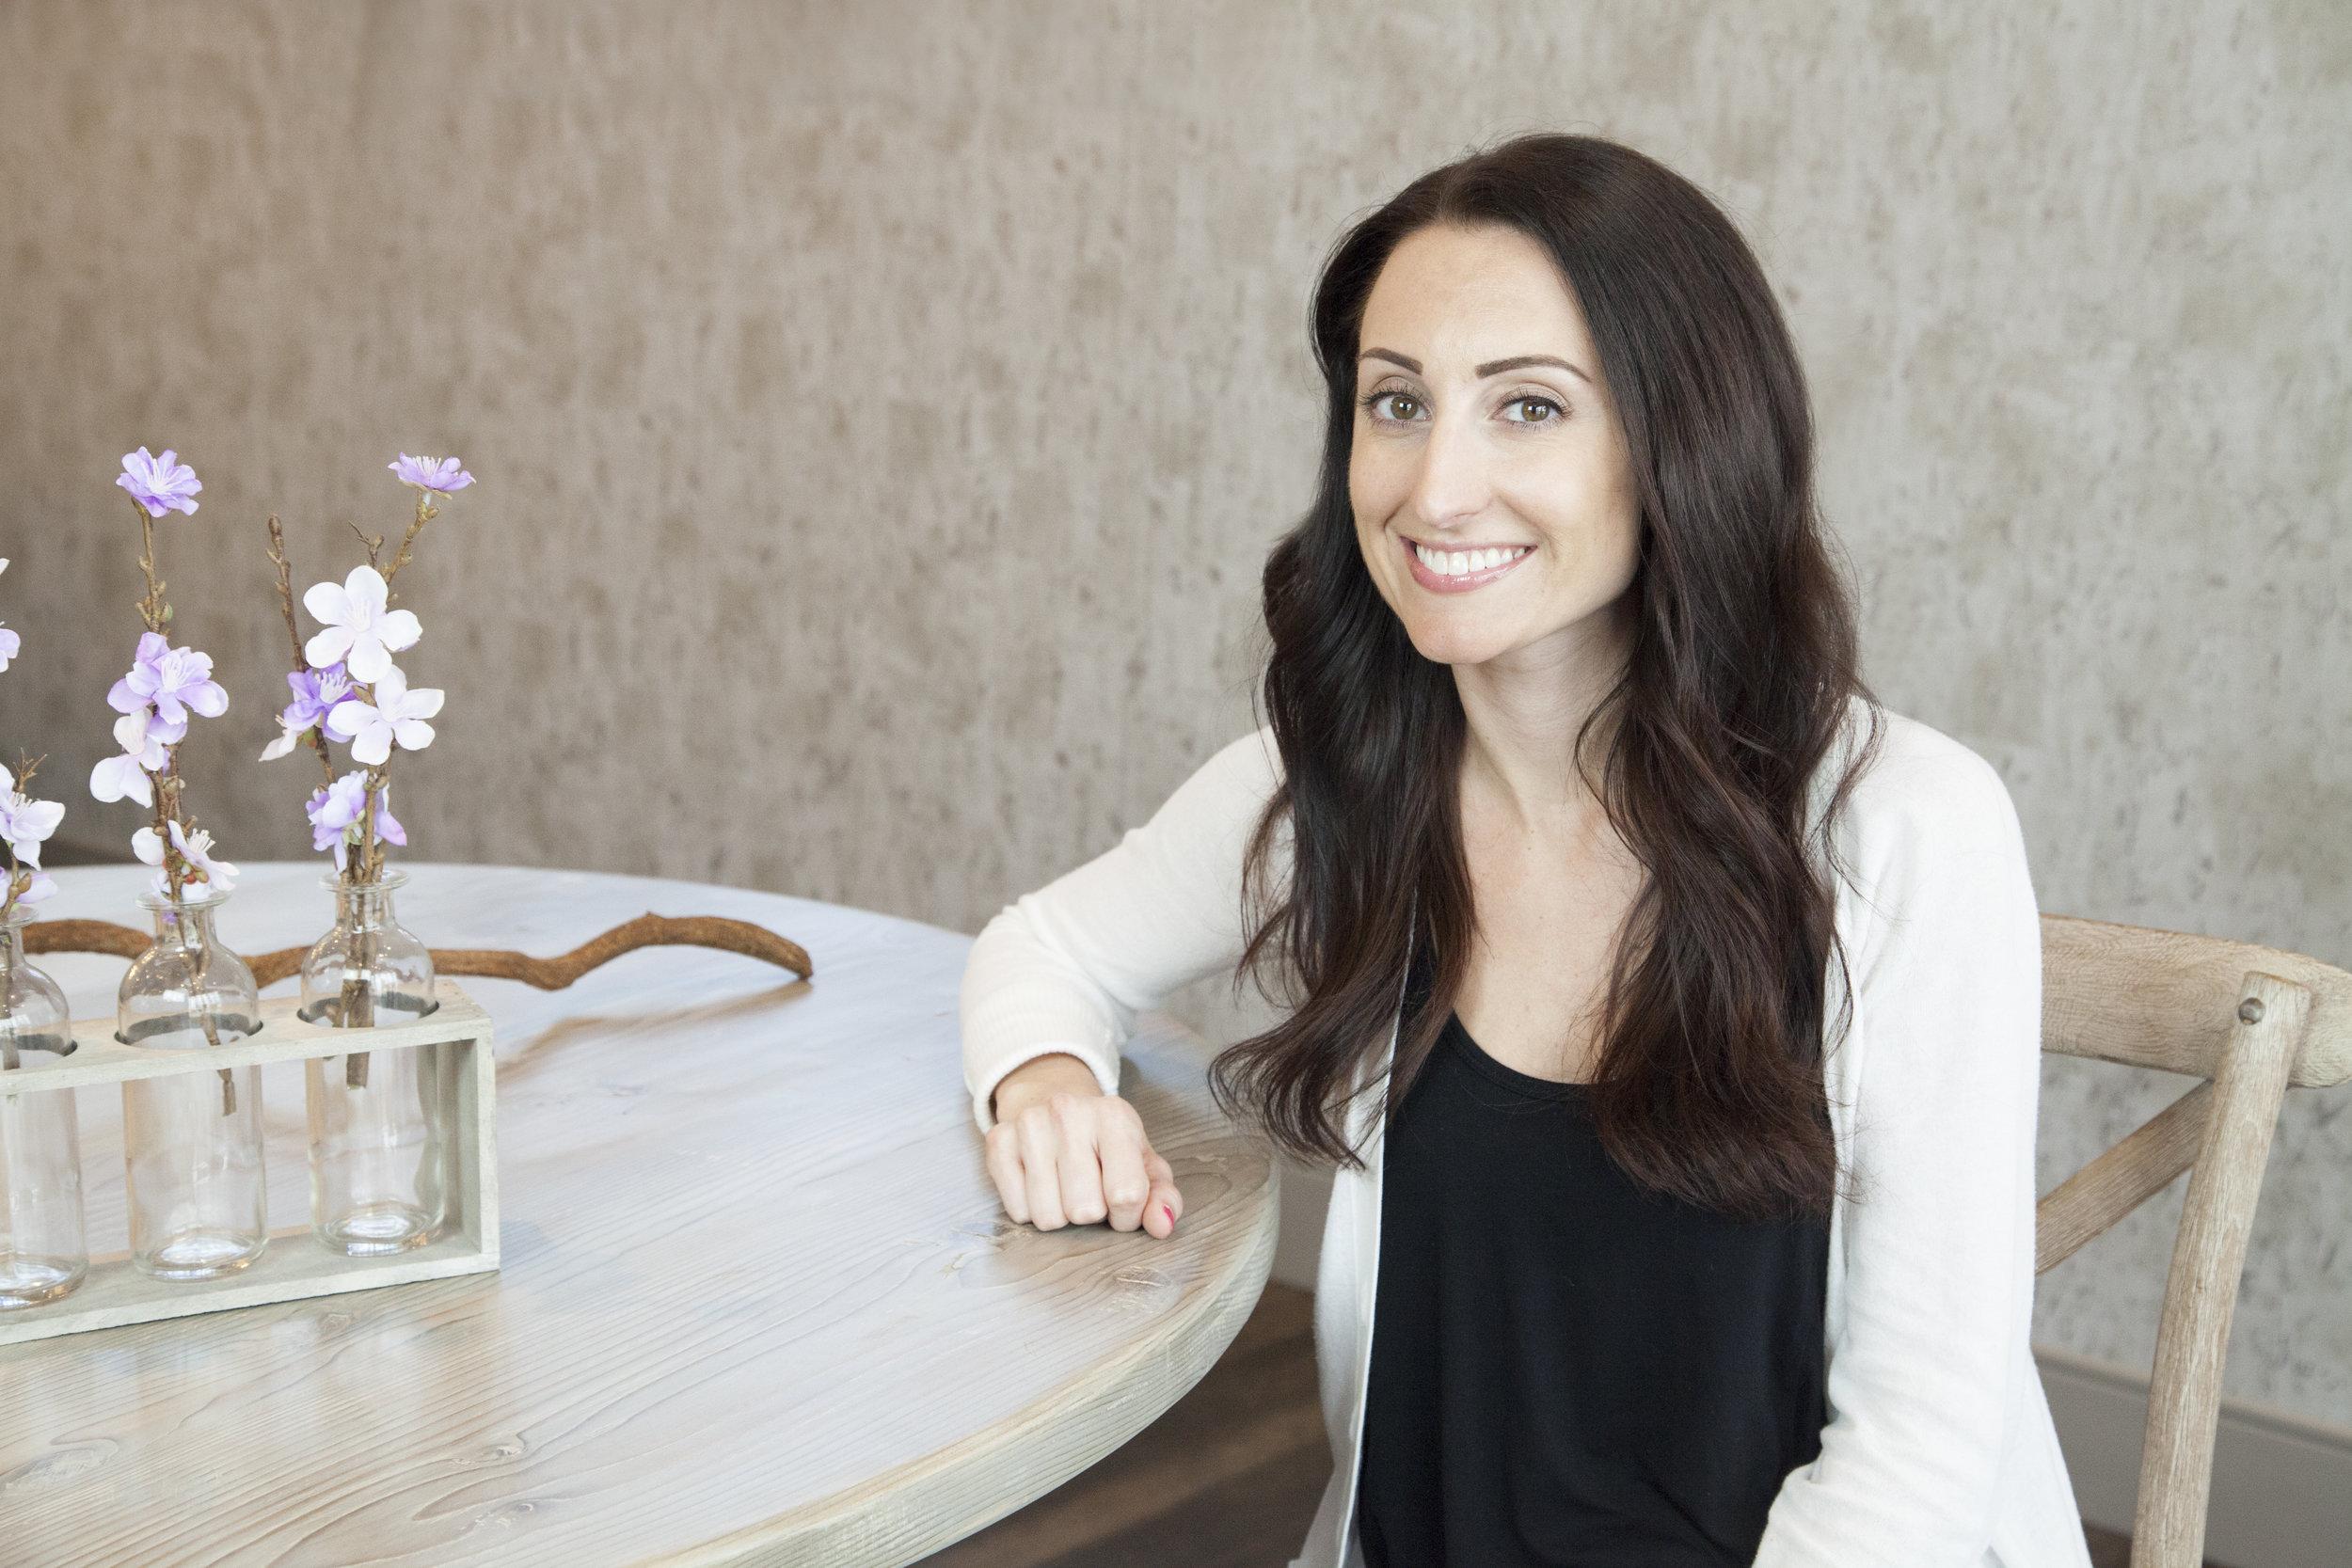 Kalie Middlebrook, Hairstylist